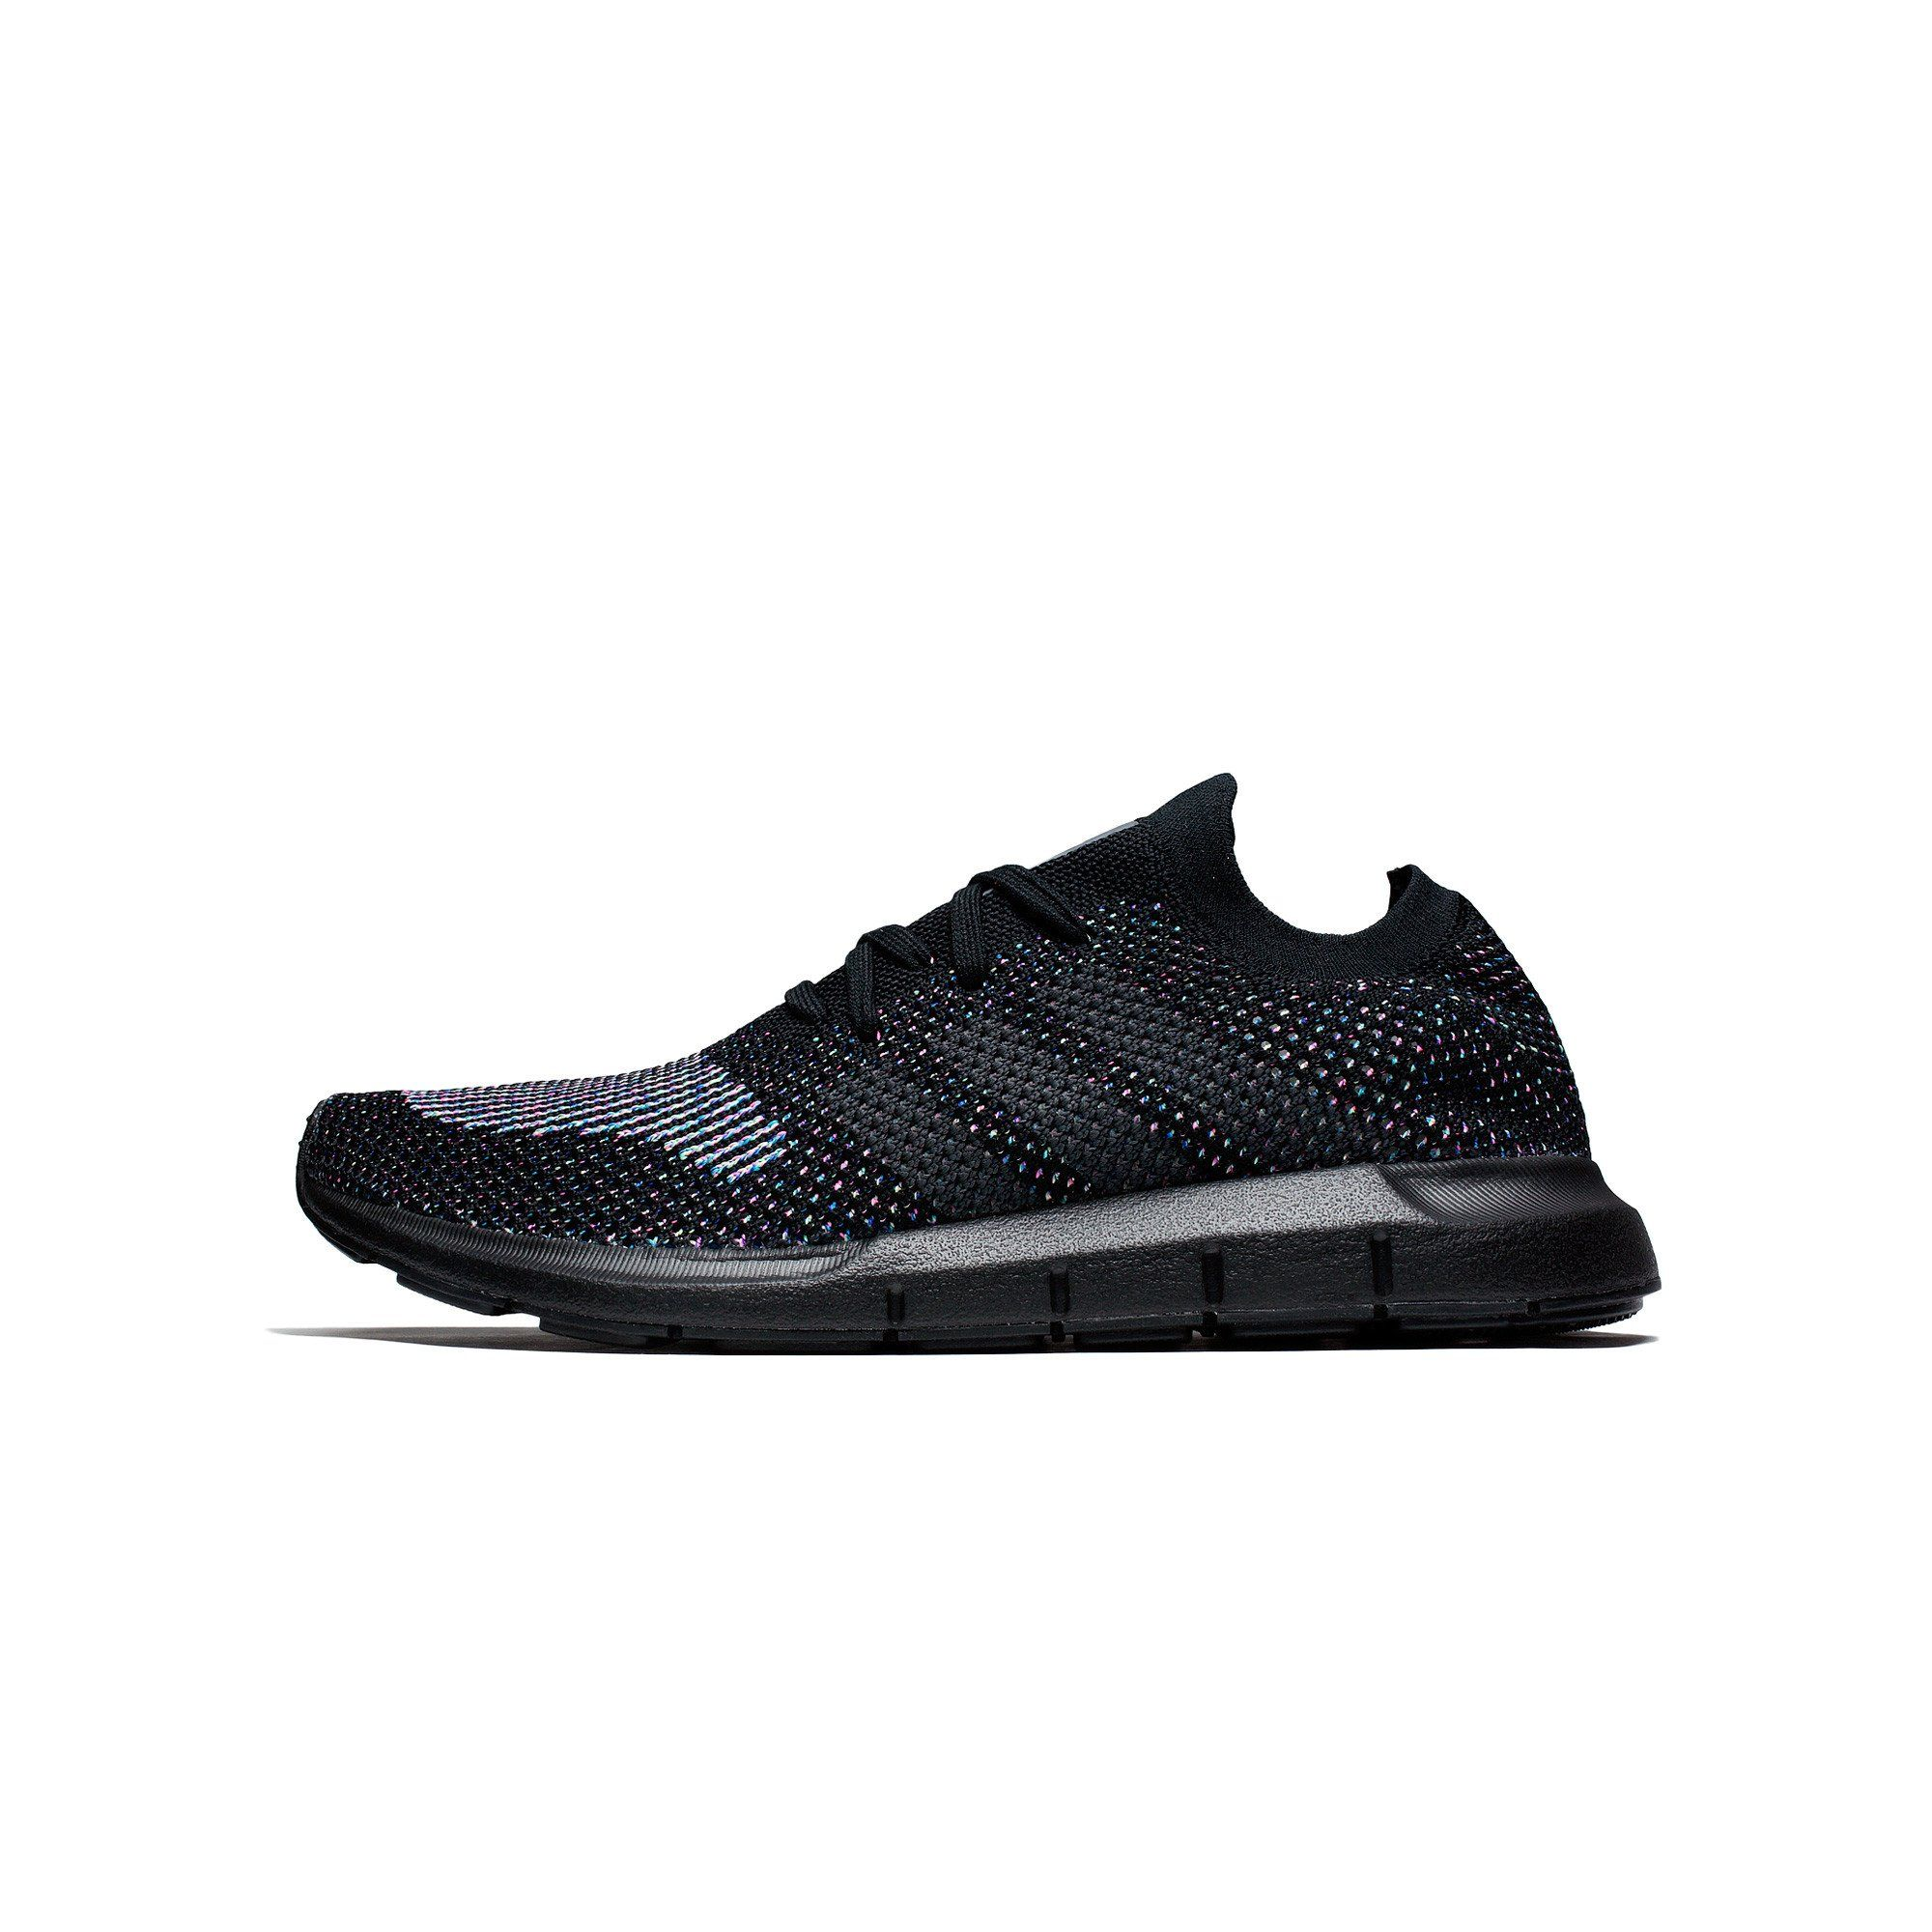 adidas originals swift run primeknit trainers in black cg4127